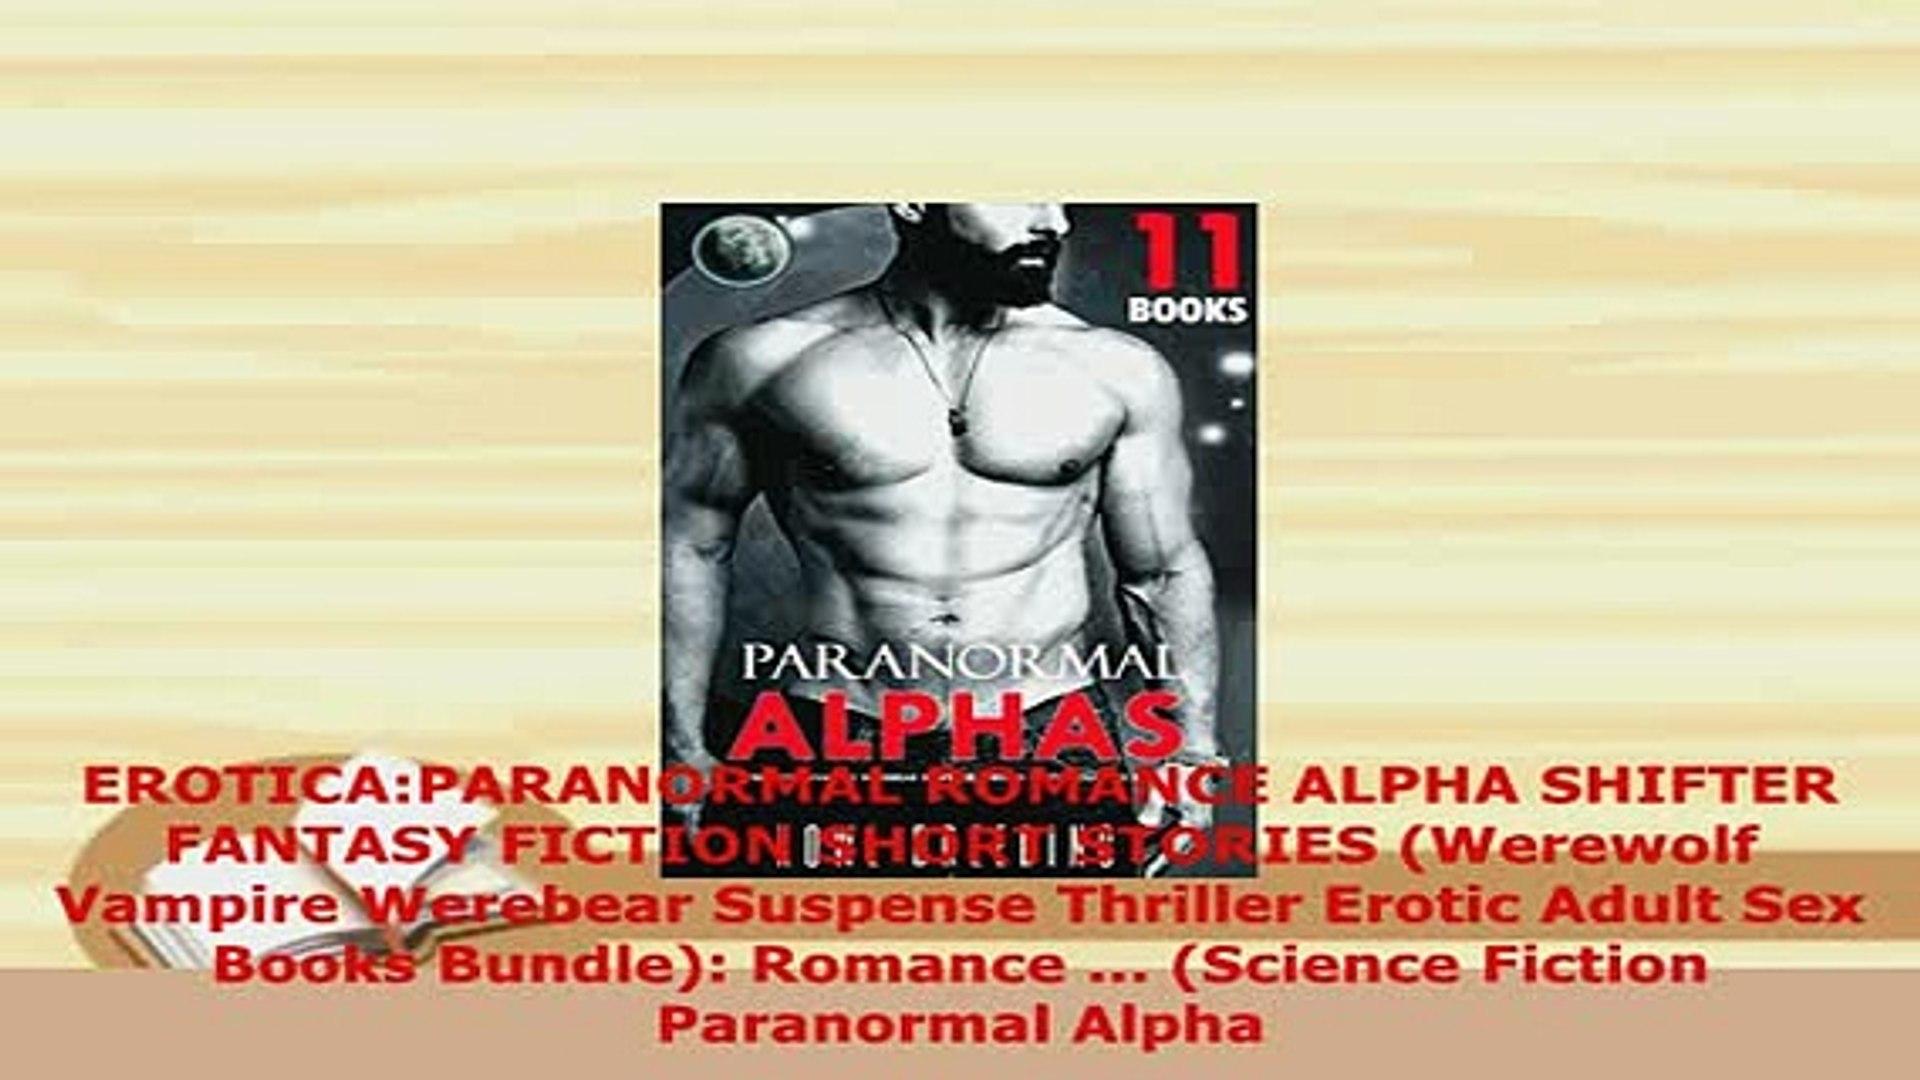 PDF EROTICAPARANORMAL ROMANCE ALPHA SHIFTER FANTASY FICTION SHORT STORIES  Werewolf Vampire Free Books